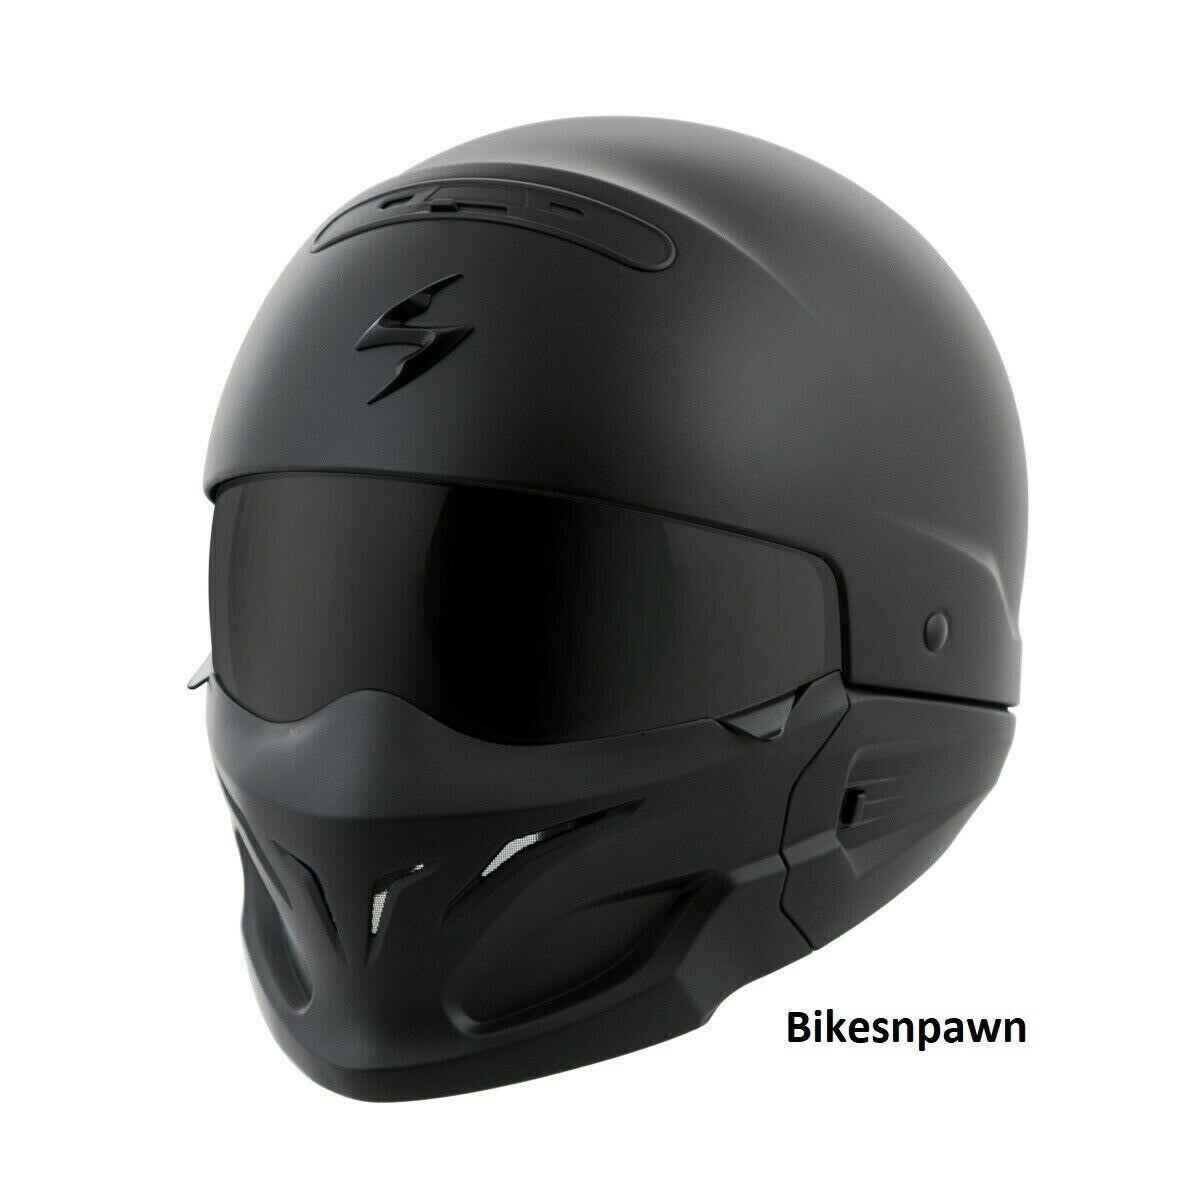 New Size 2XL Scorpion EXO Covert Matt Black 3 in 1 Motorcycle Helmet DOT